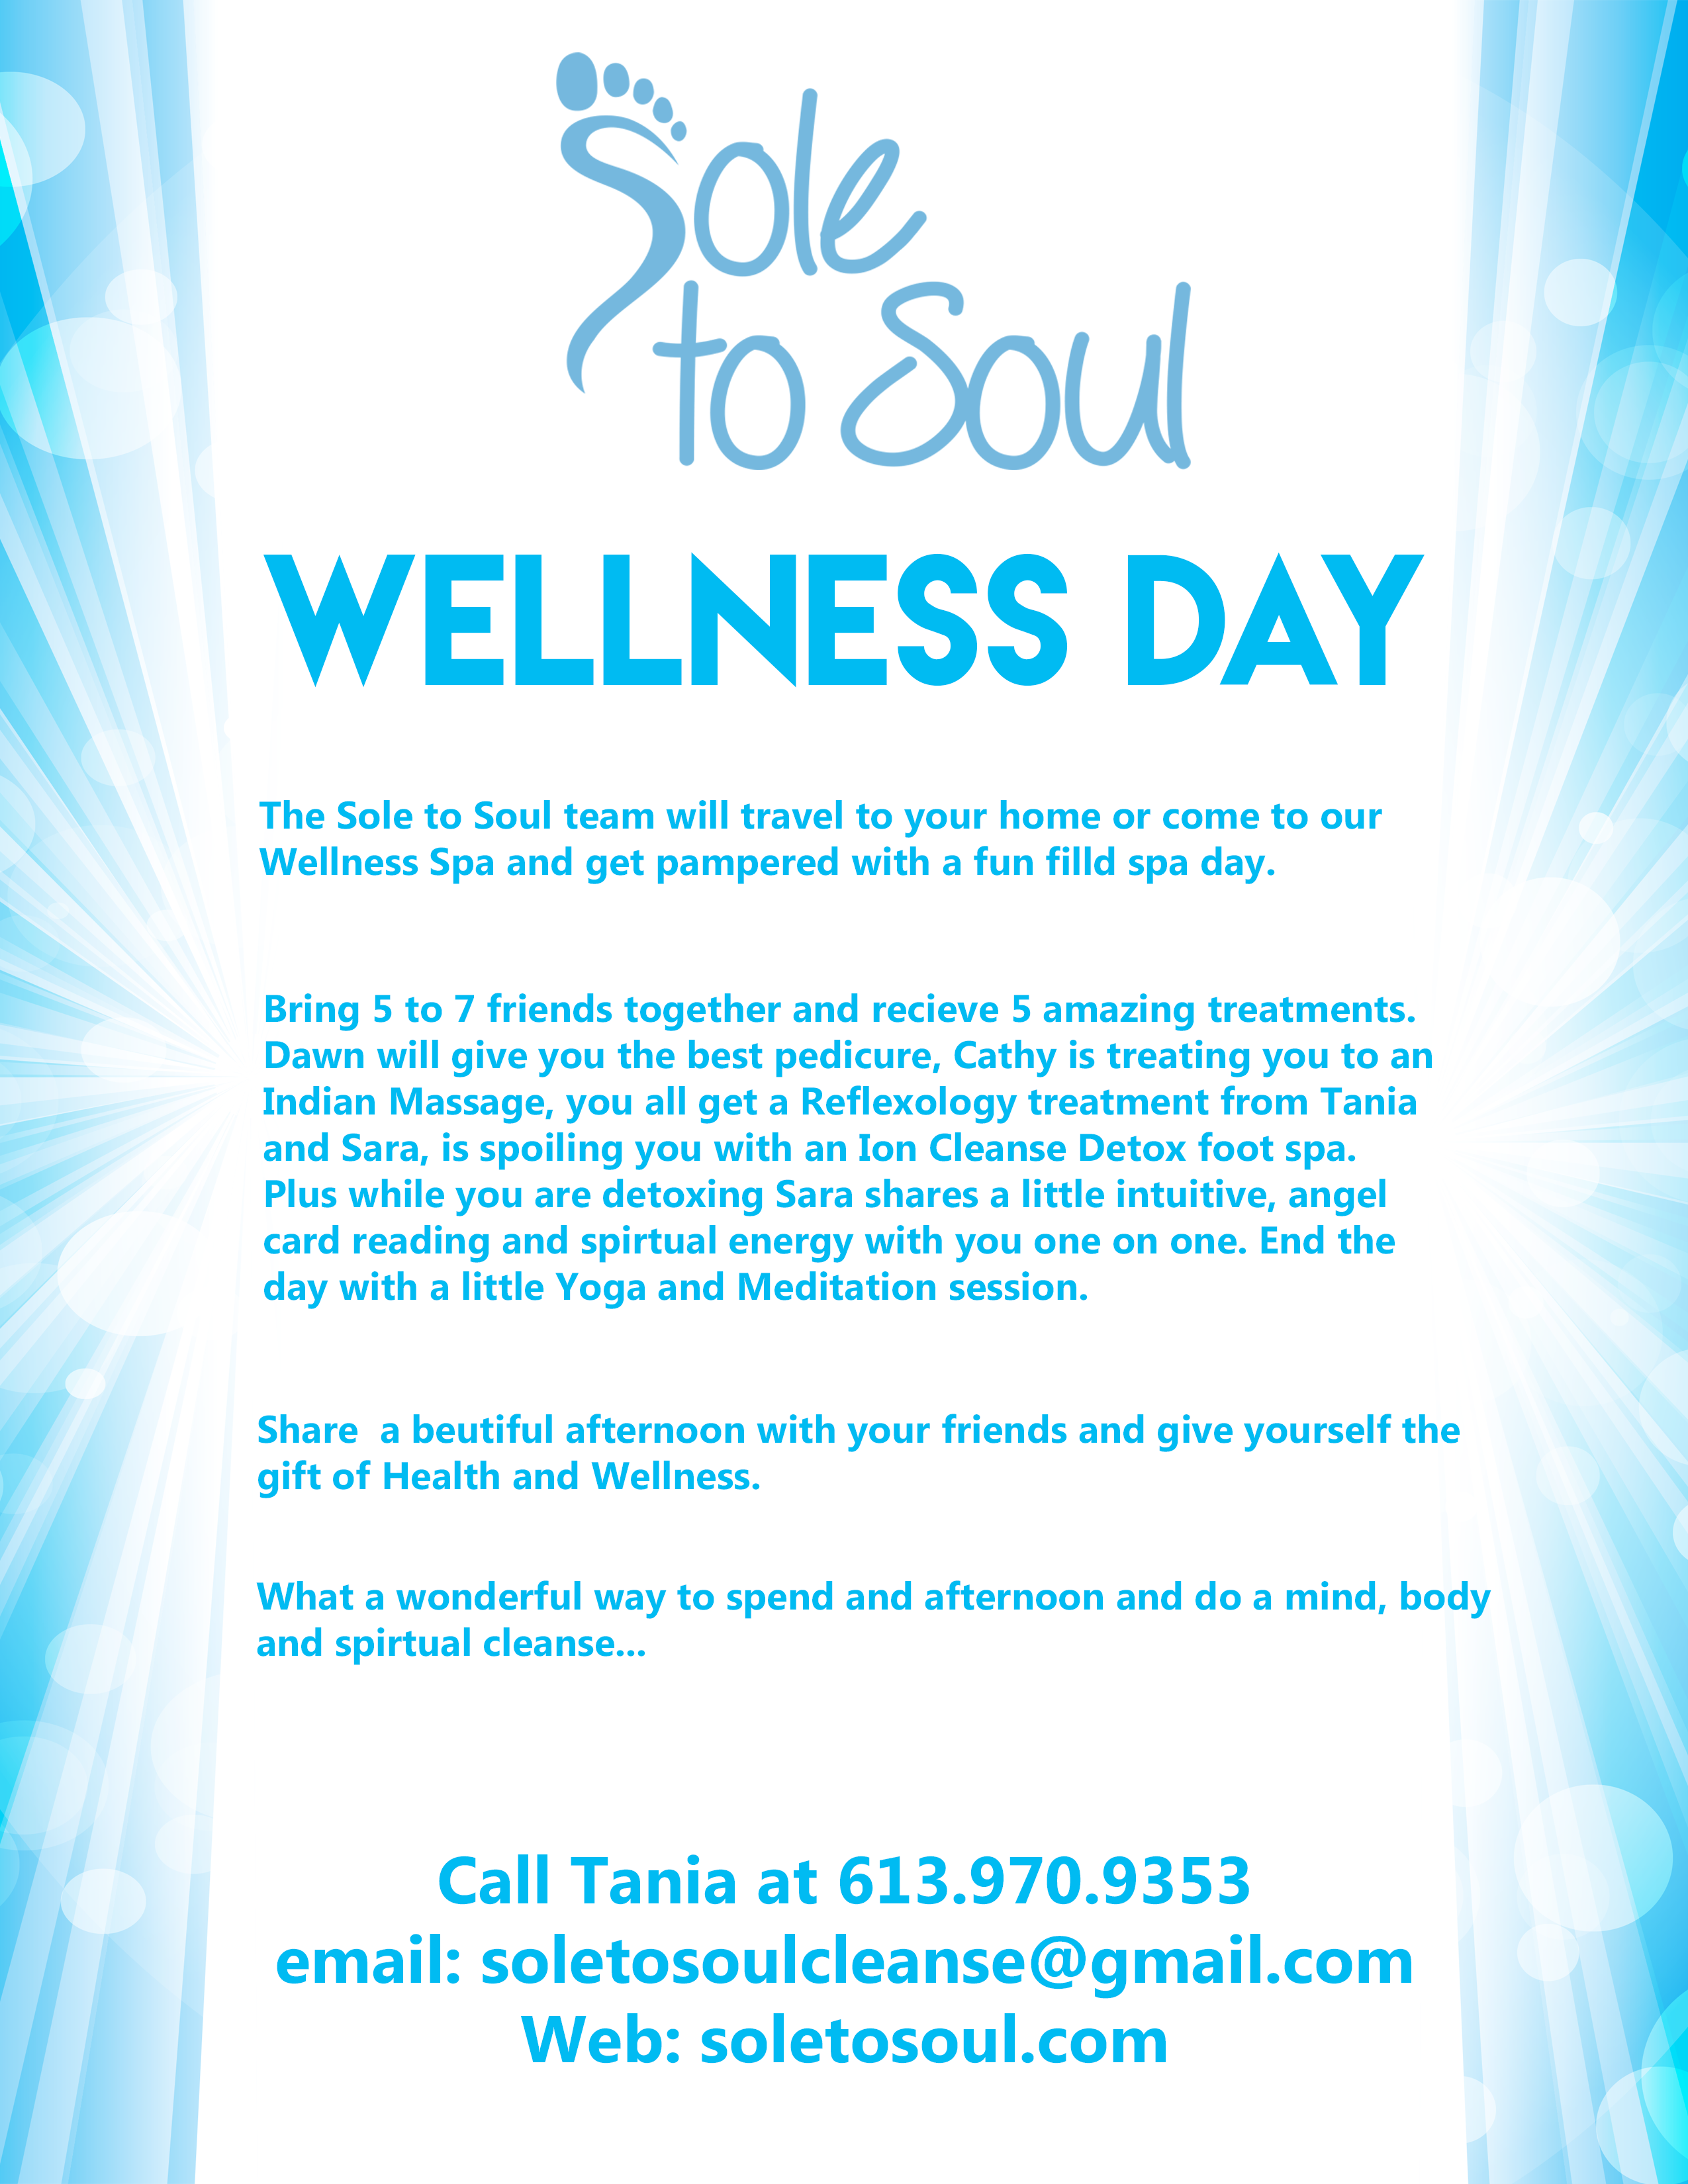 WellnessDay